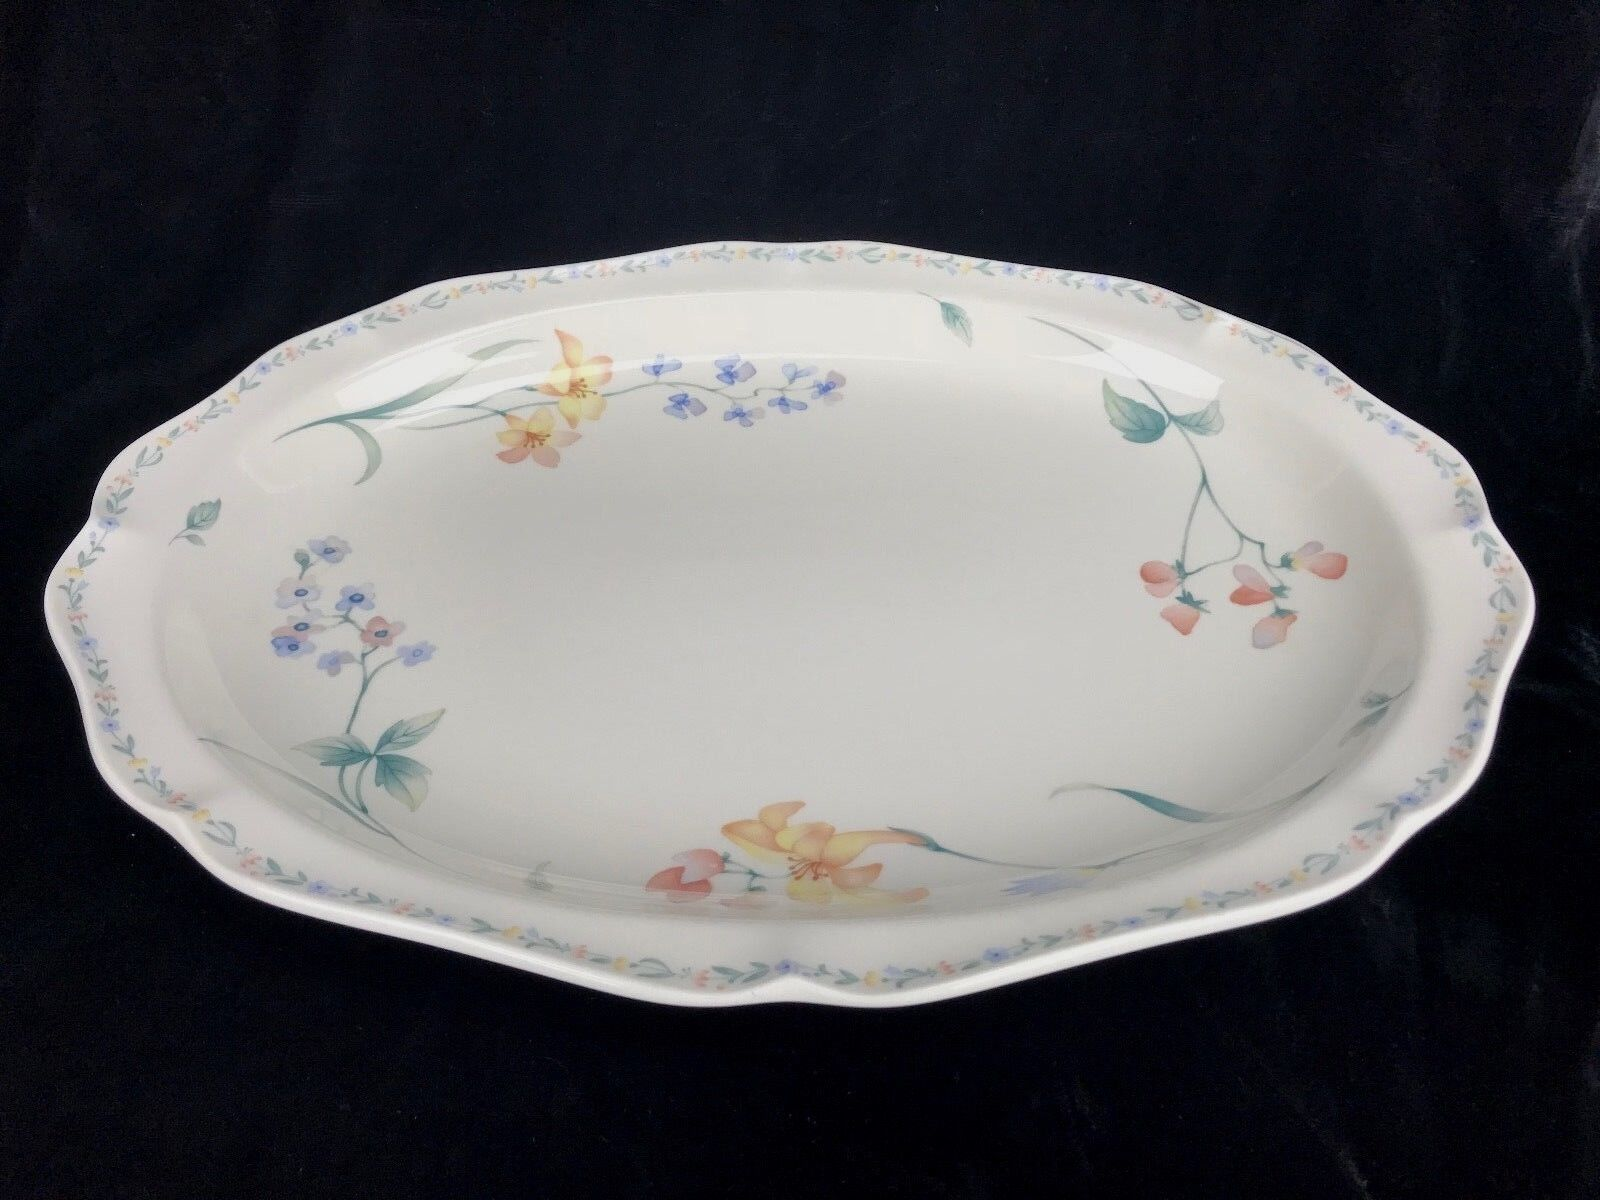 Noritake American Flowers Serving Platter 14 1 2 X 10 1 2 Japan